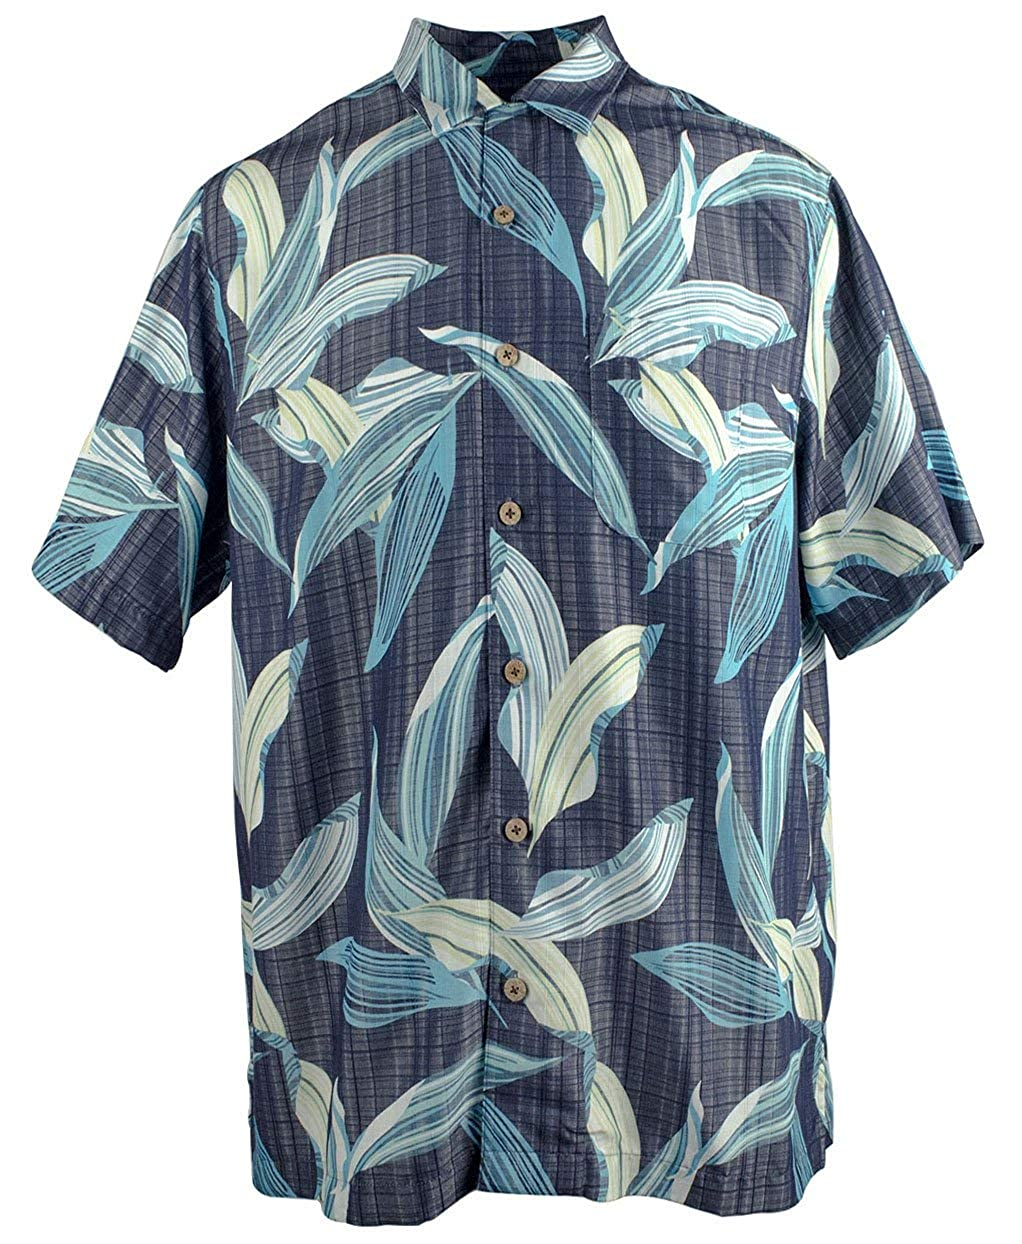 Mens Palm Print Woven Short Sleeve Shirt